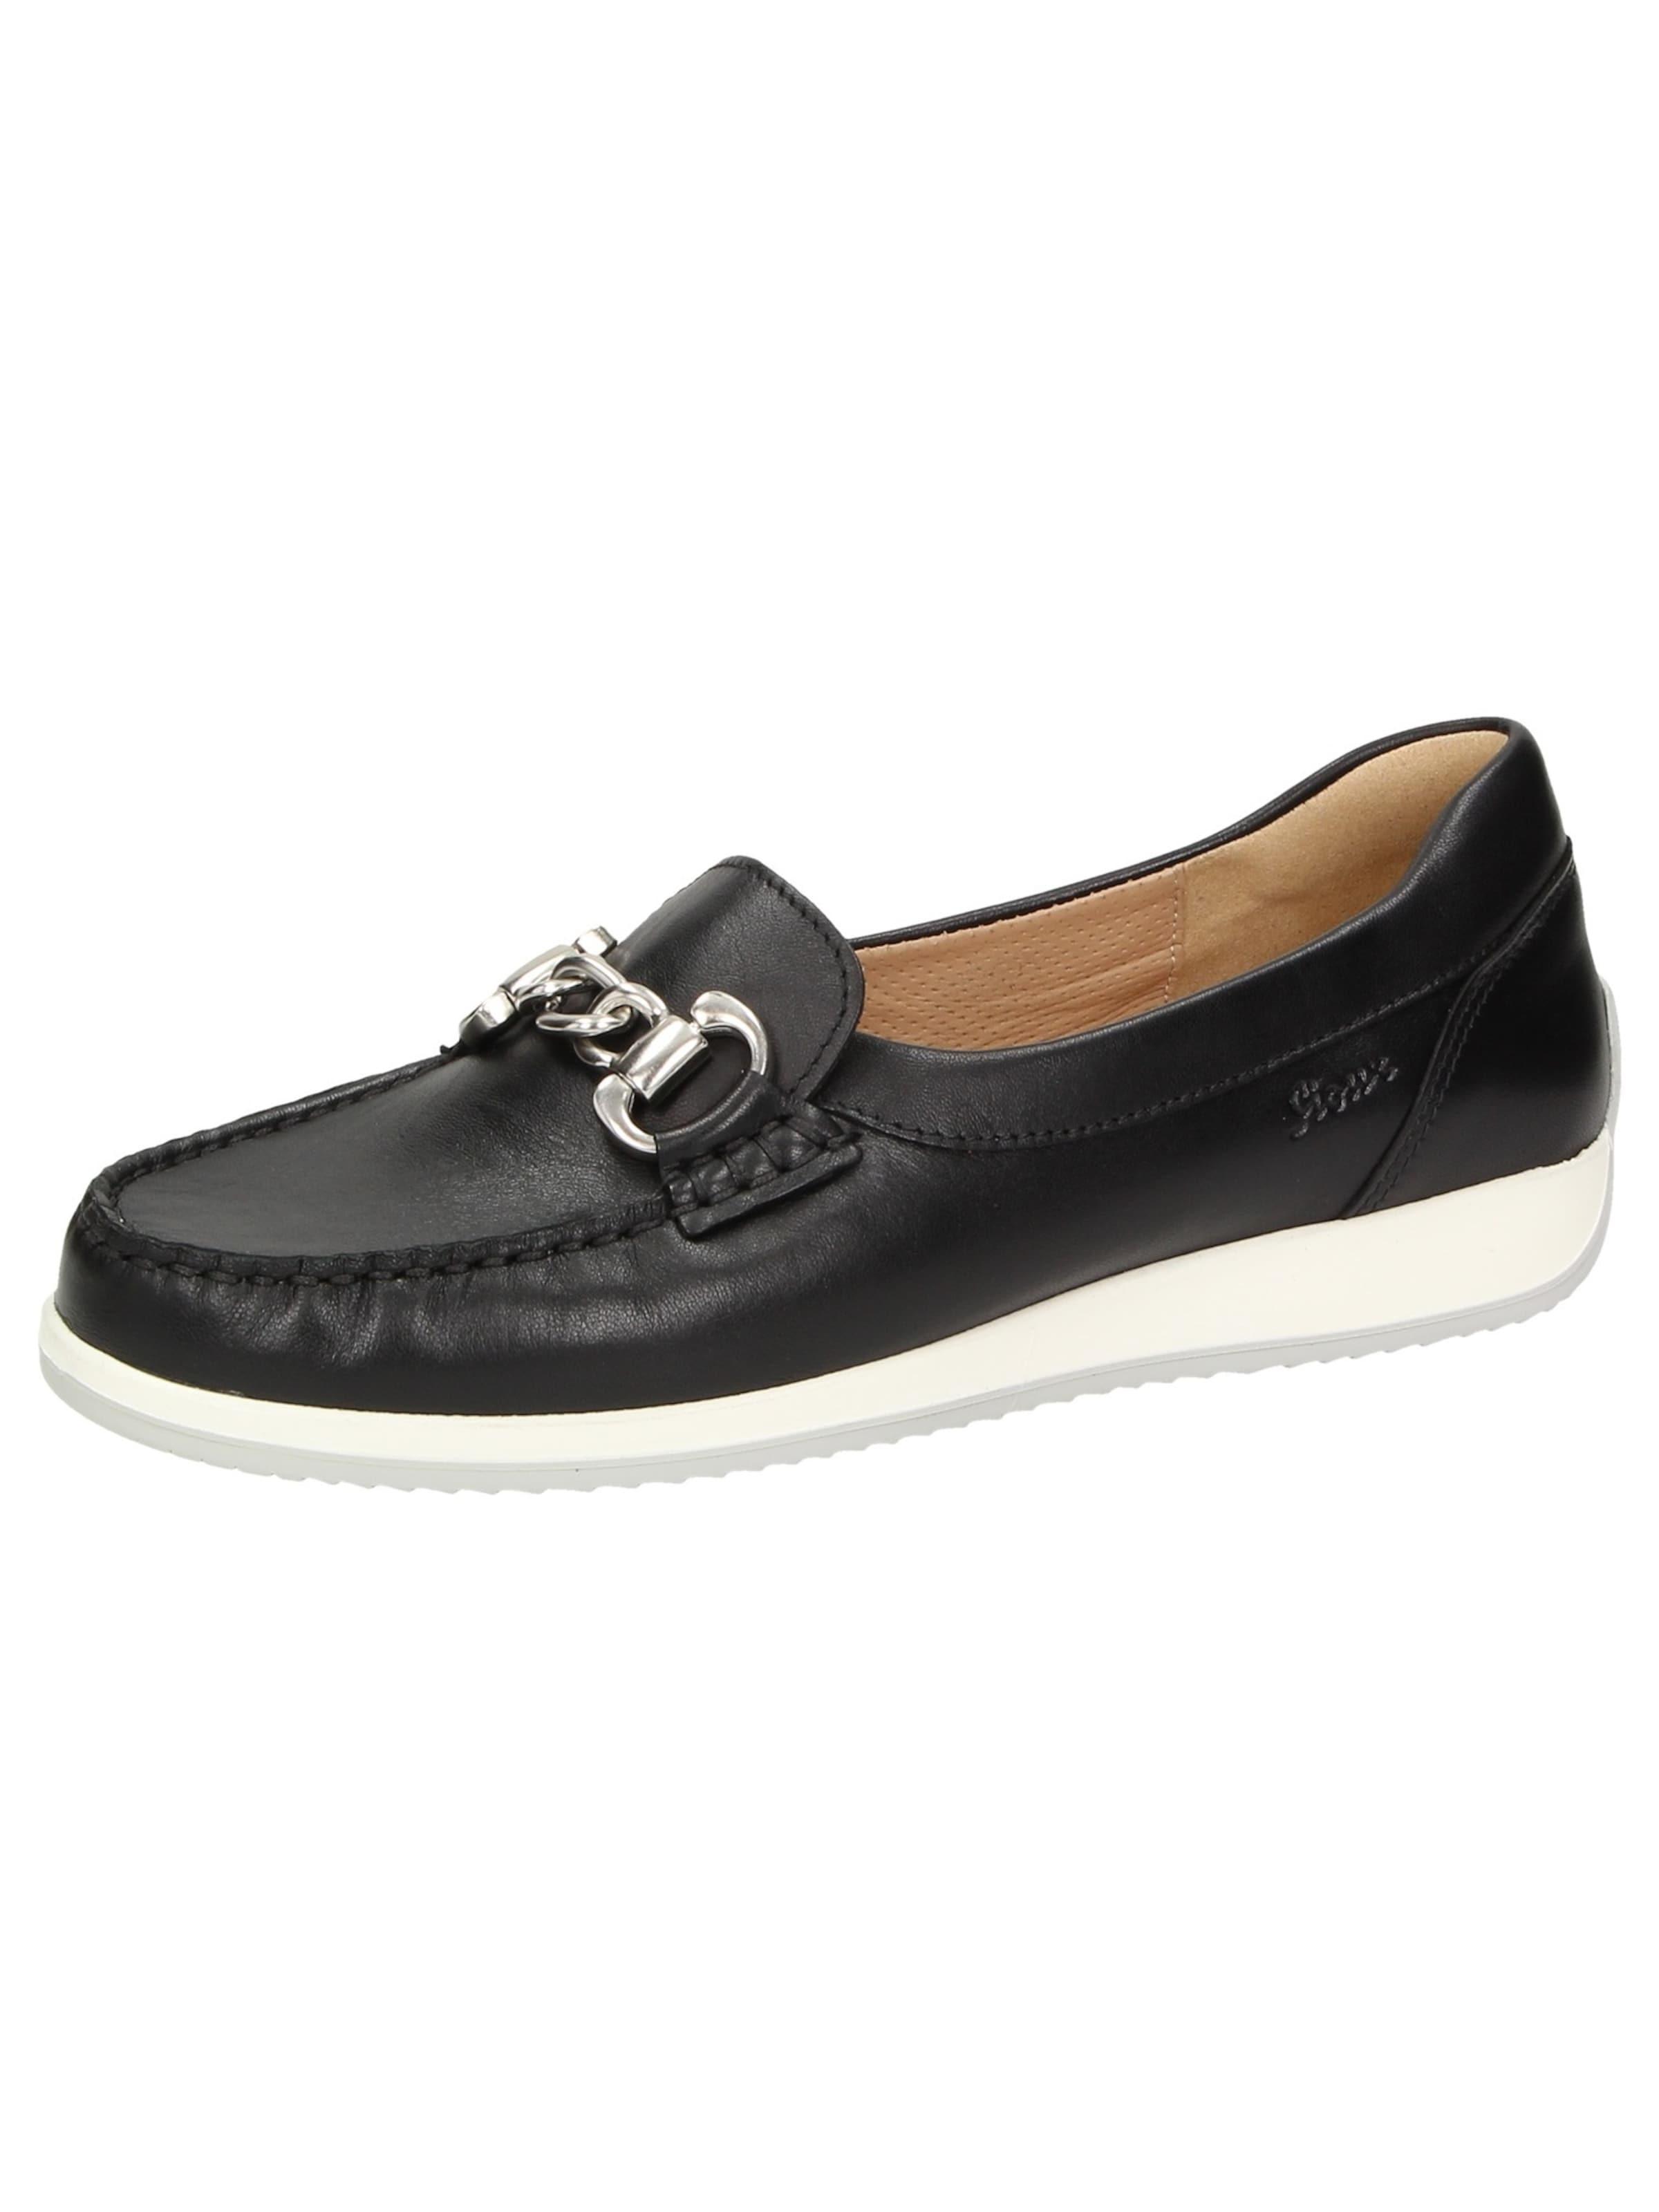 Haltbare Mode billige Schuhe SIOUX | Slipper 'Fularia-701-XL' Schuhe Gut getragene Schuhe